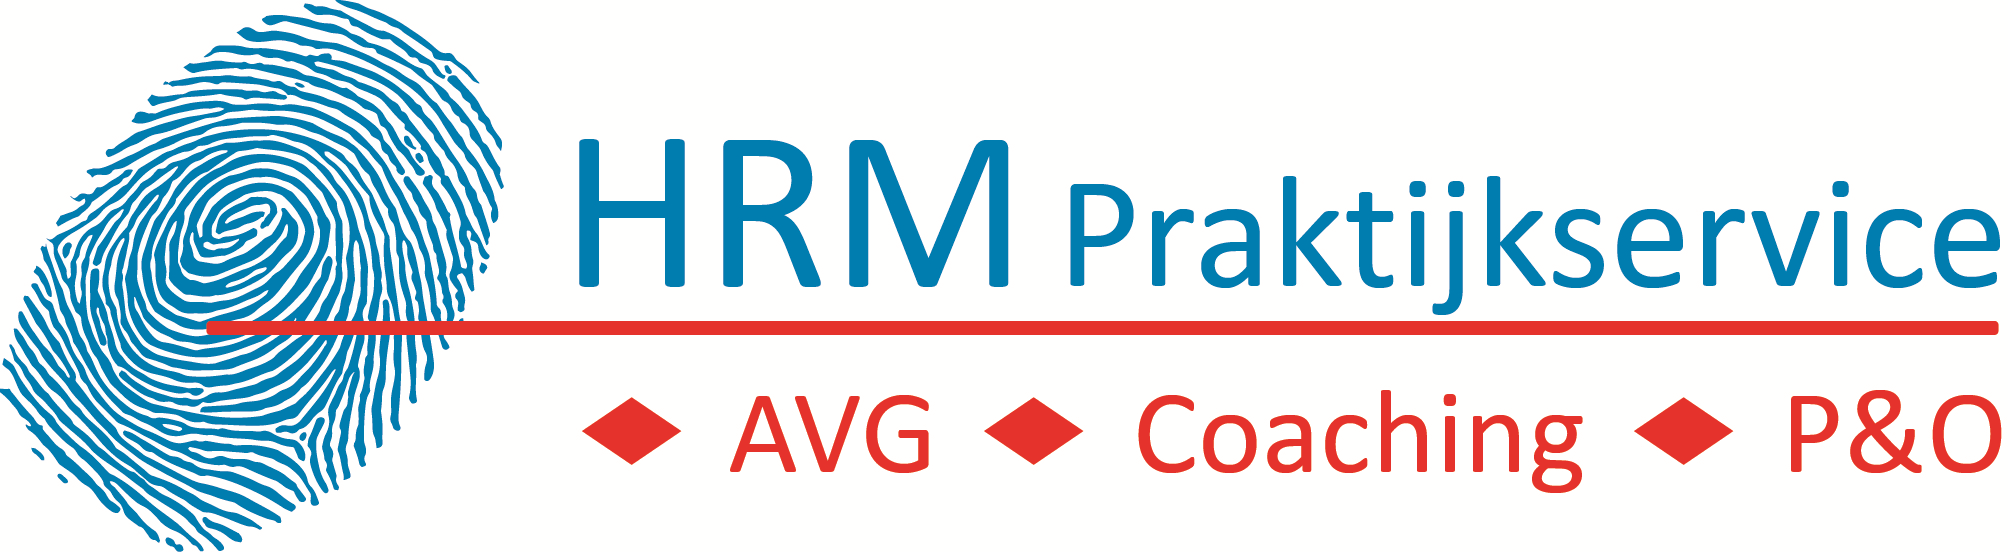 HRM Praktijkservice